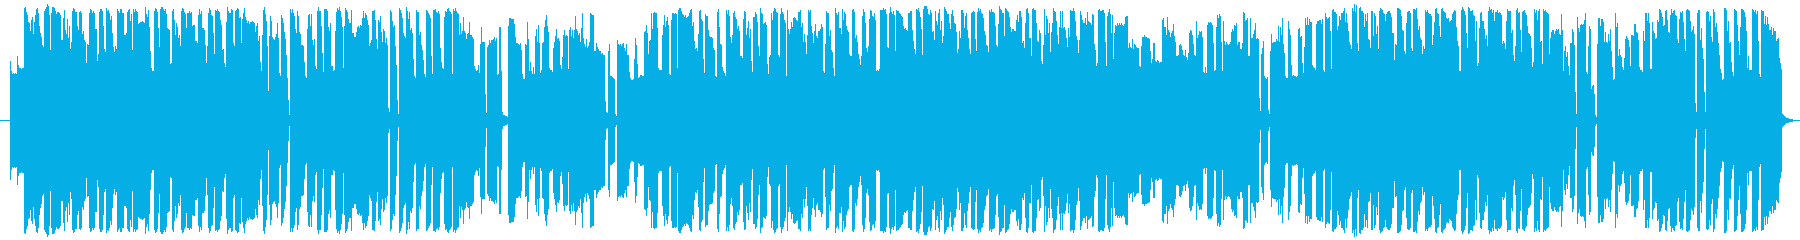 8bit風ピコピコサウンドの再生済みの波形